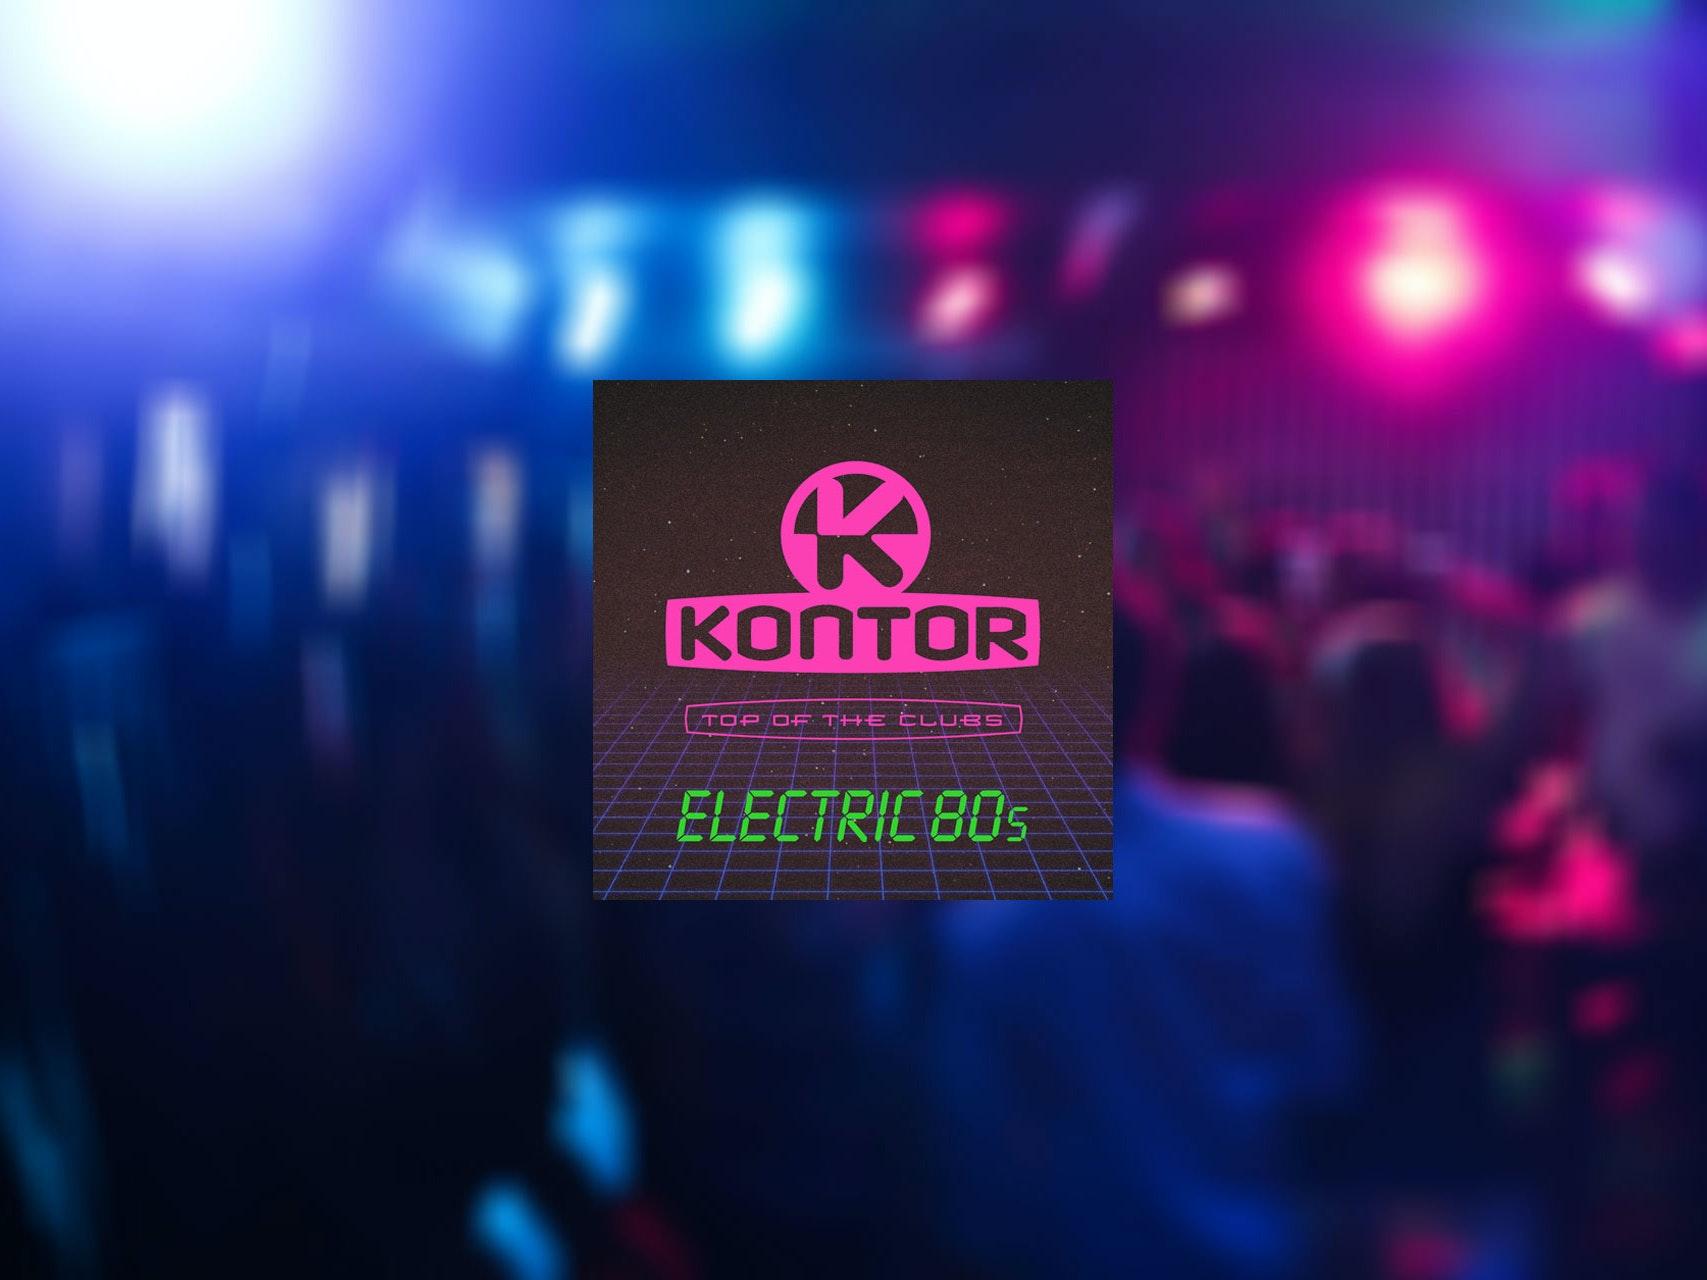 KONTOR ELECTRIC 80S